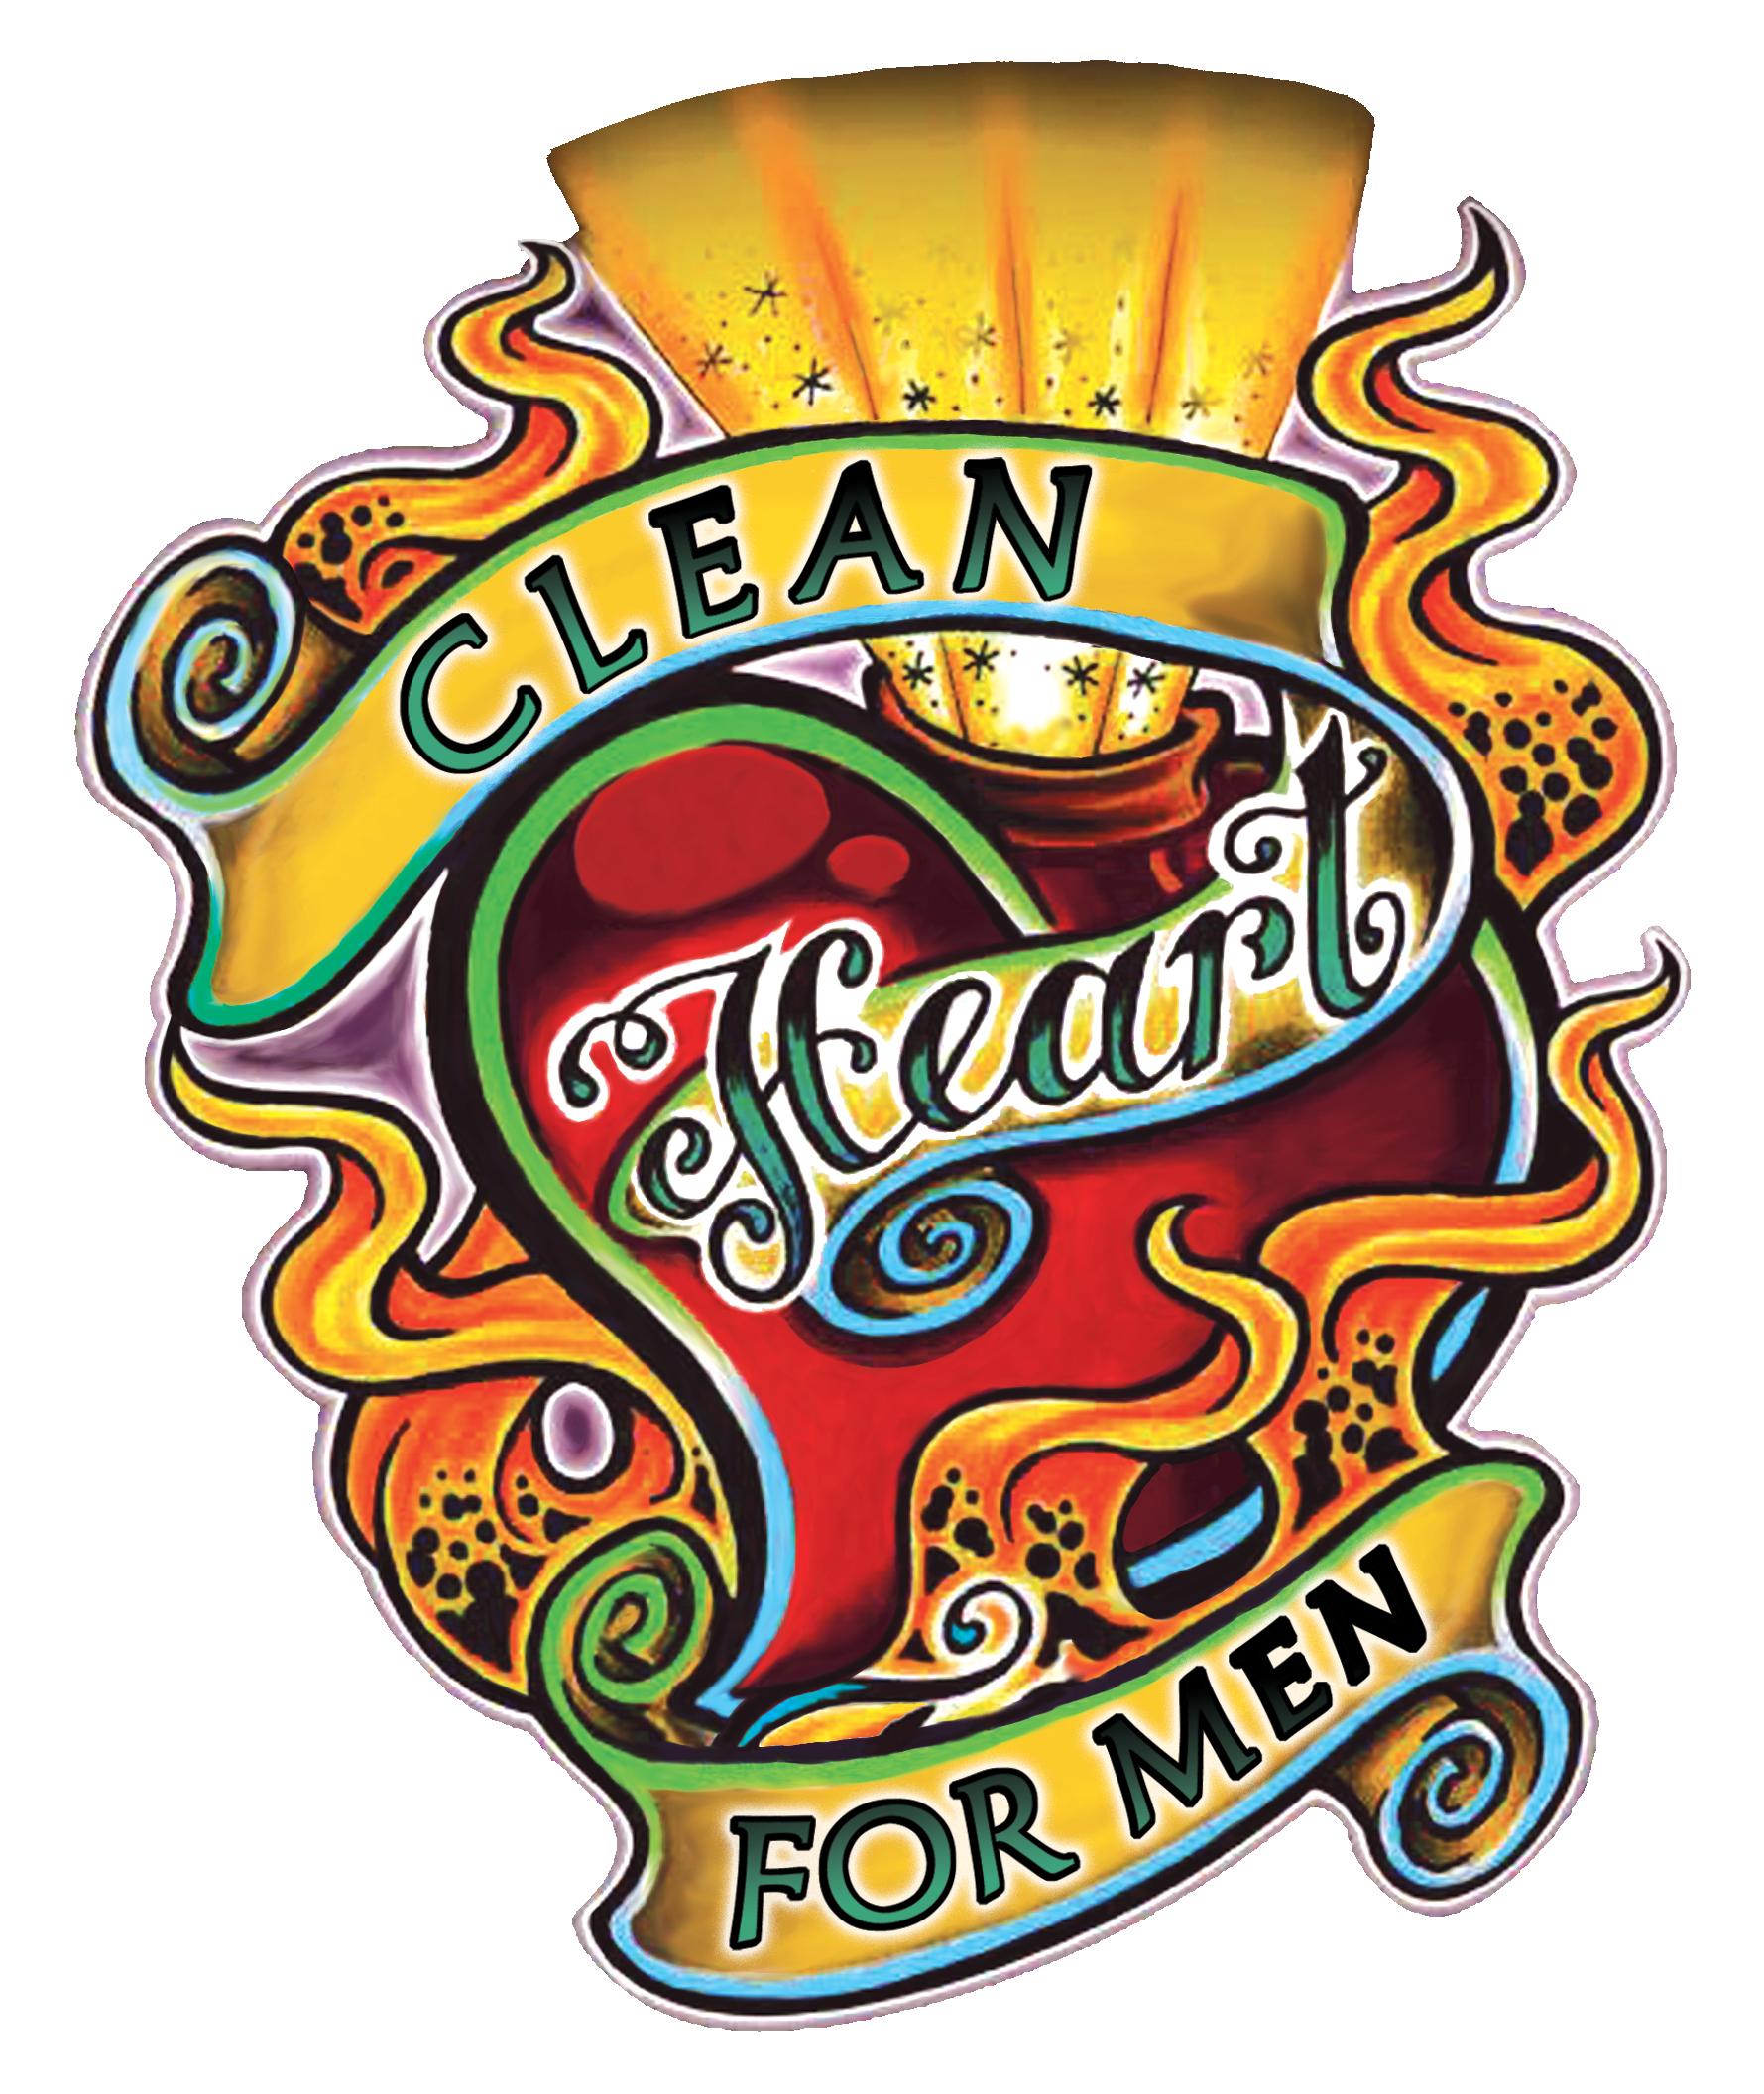 Clean clipart male clean. Statistics heart for men